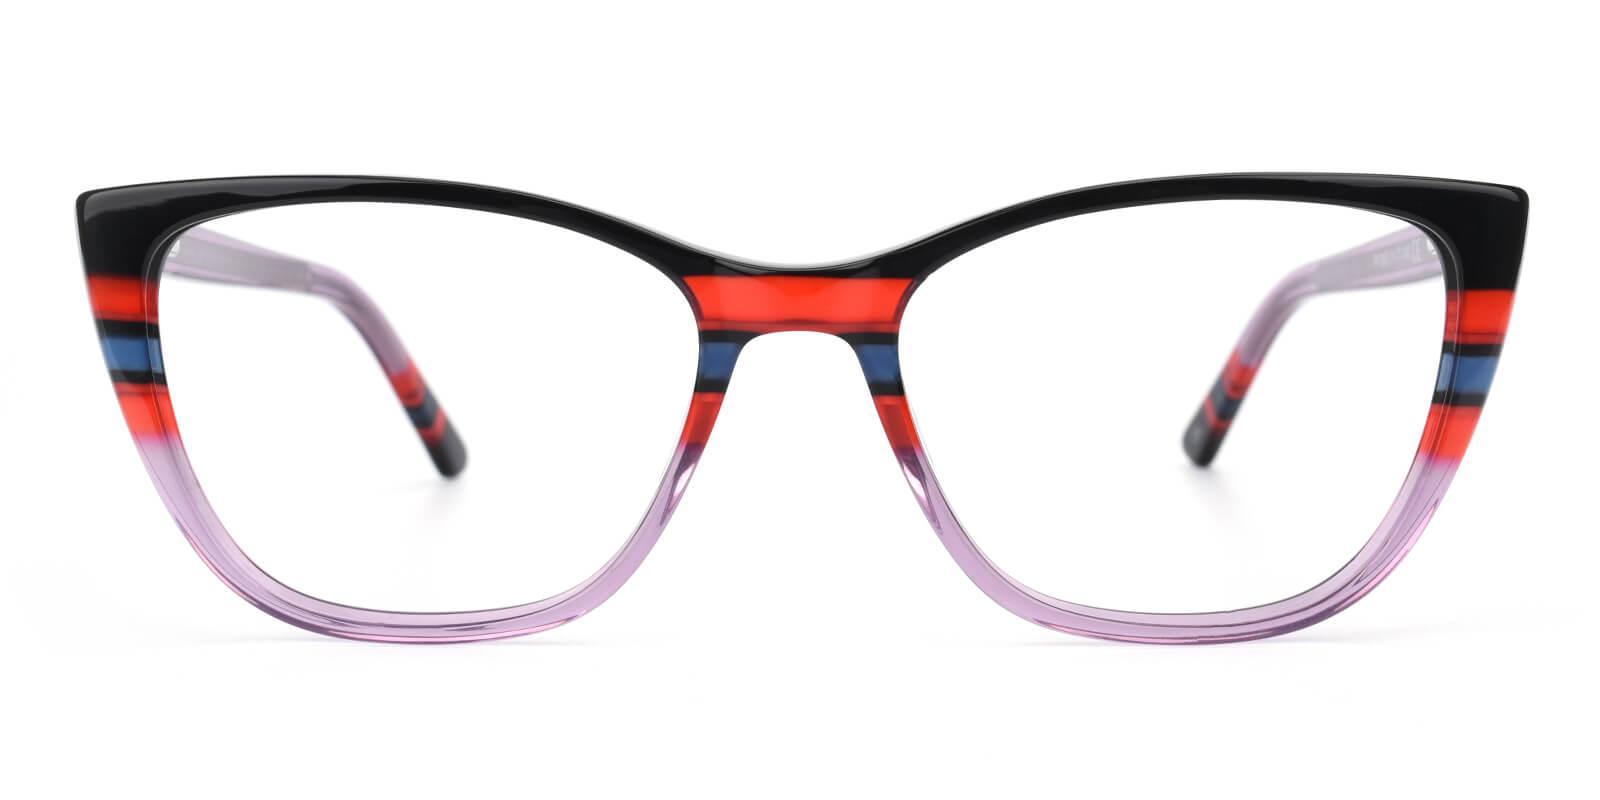 Bblythe-Purple-Cat-Acetate-Eyeglasses-detail